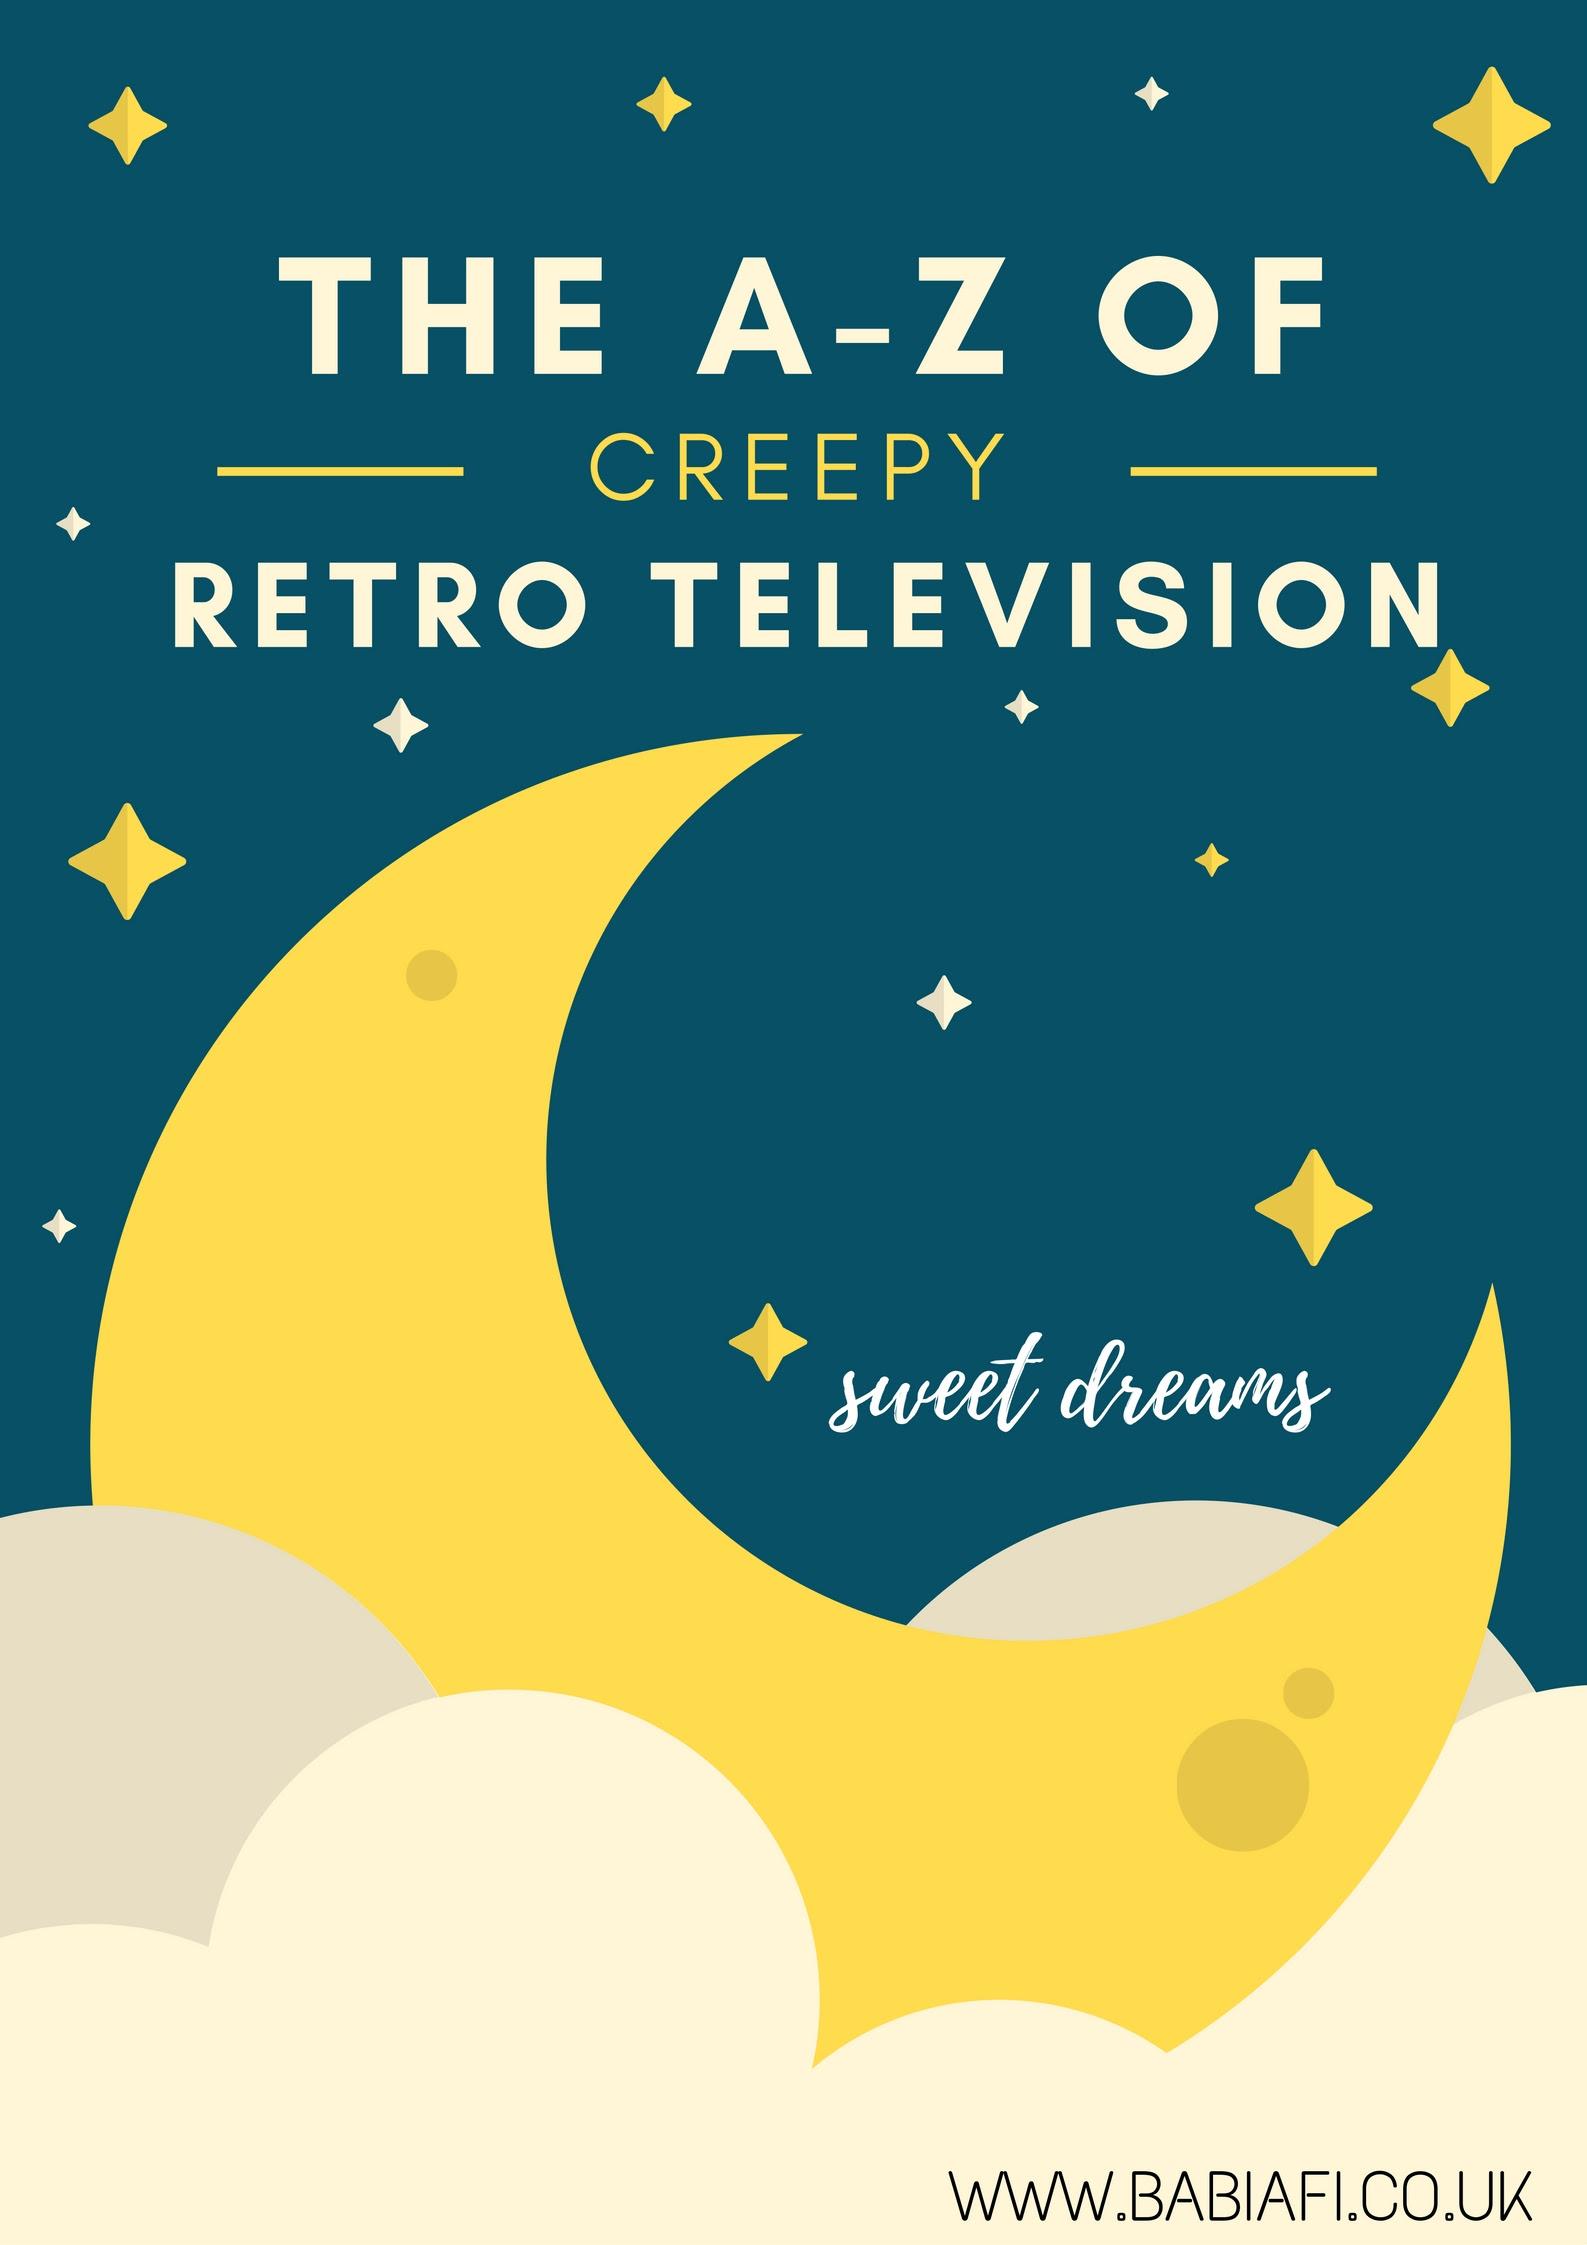 The A-Z of Creepy Retro Television